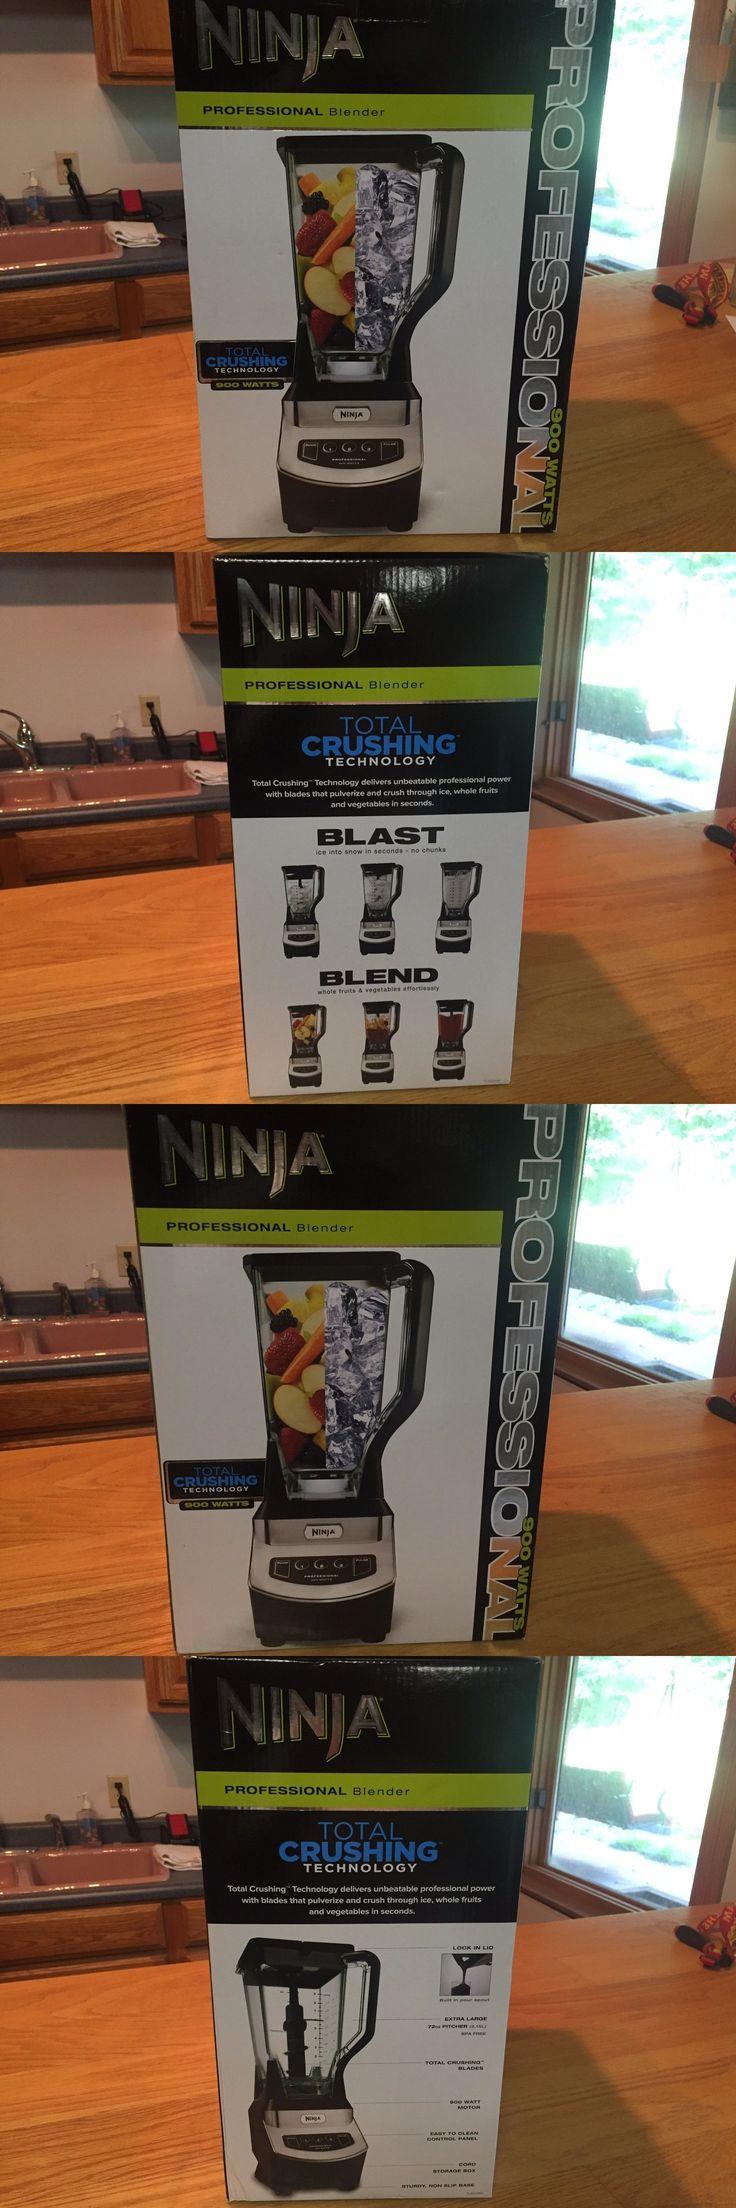 Blenders Countertop 133704: Brand New...Ninja Professional Blender, Nj600wm - Total Crushing Technology 900W -> BUY IT NOW ONLY: $52.5 on eBay!